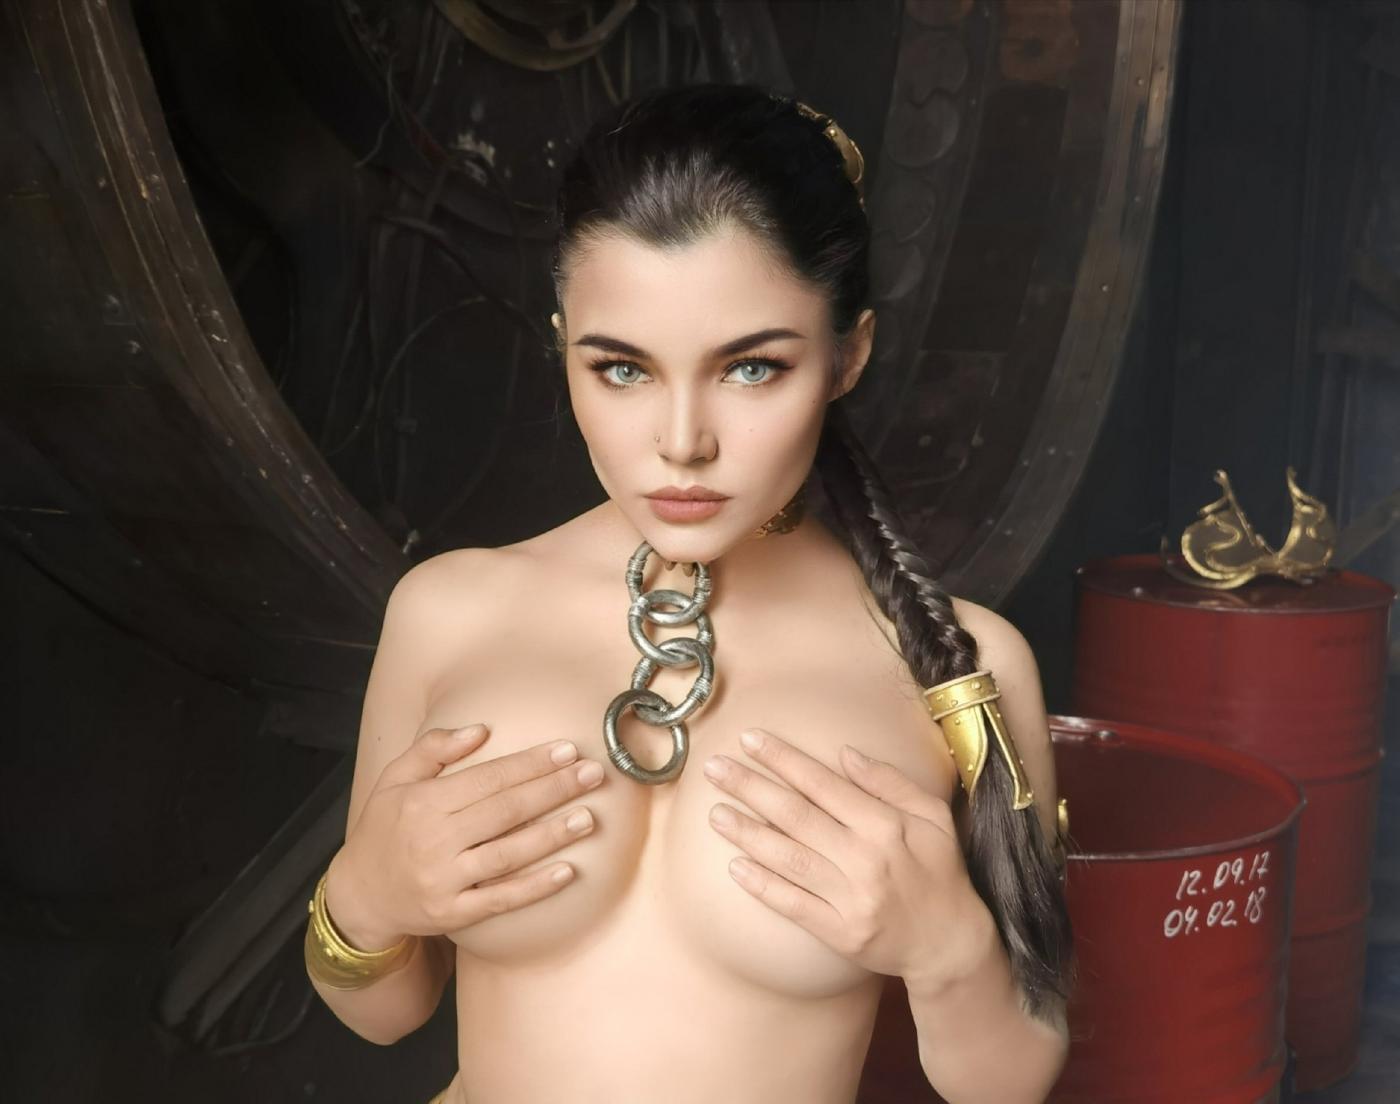 Kalinka Fox Nude Princess Leia Cosplay Set Leaked Xptedu